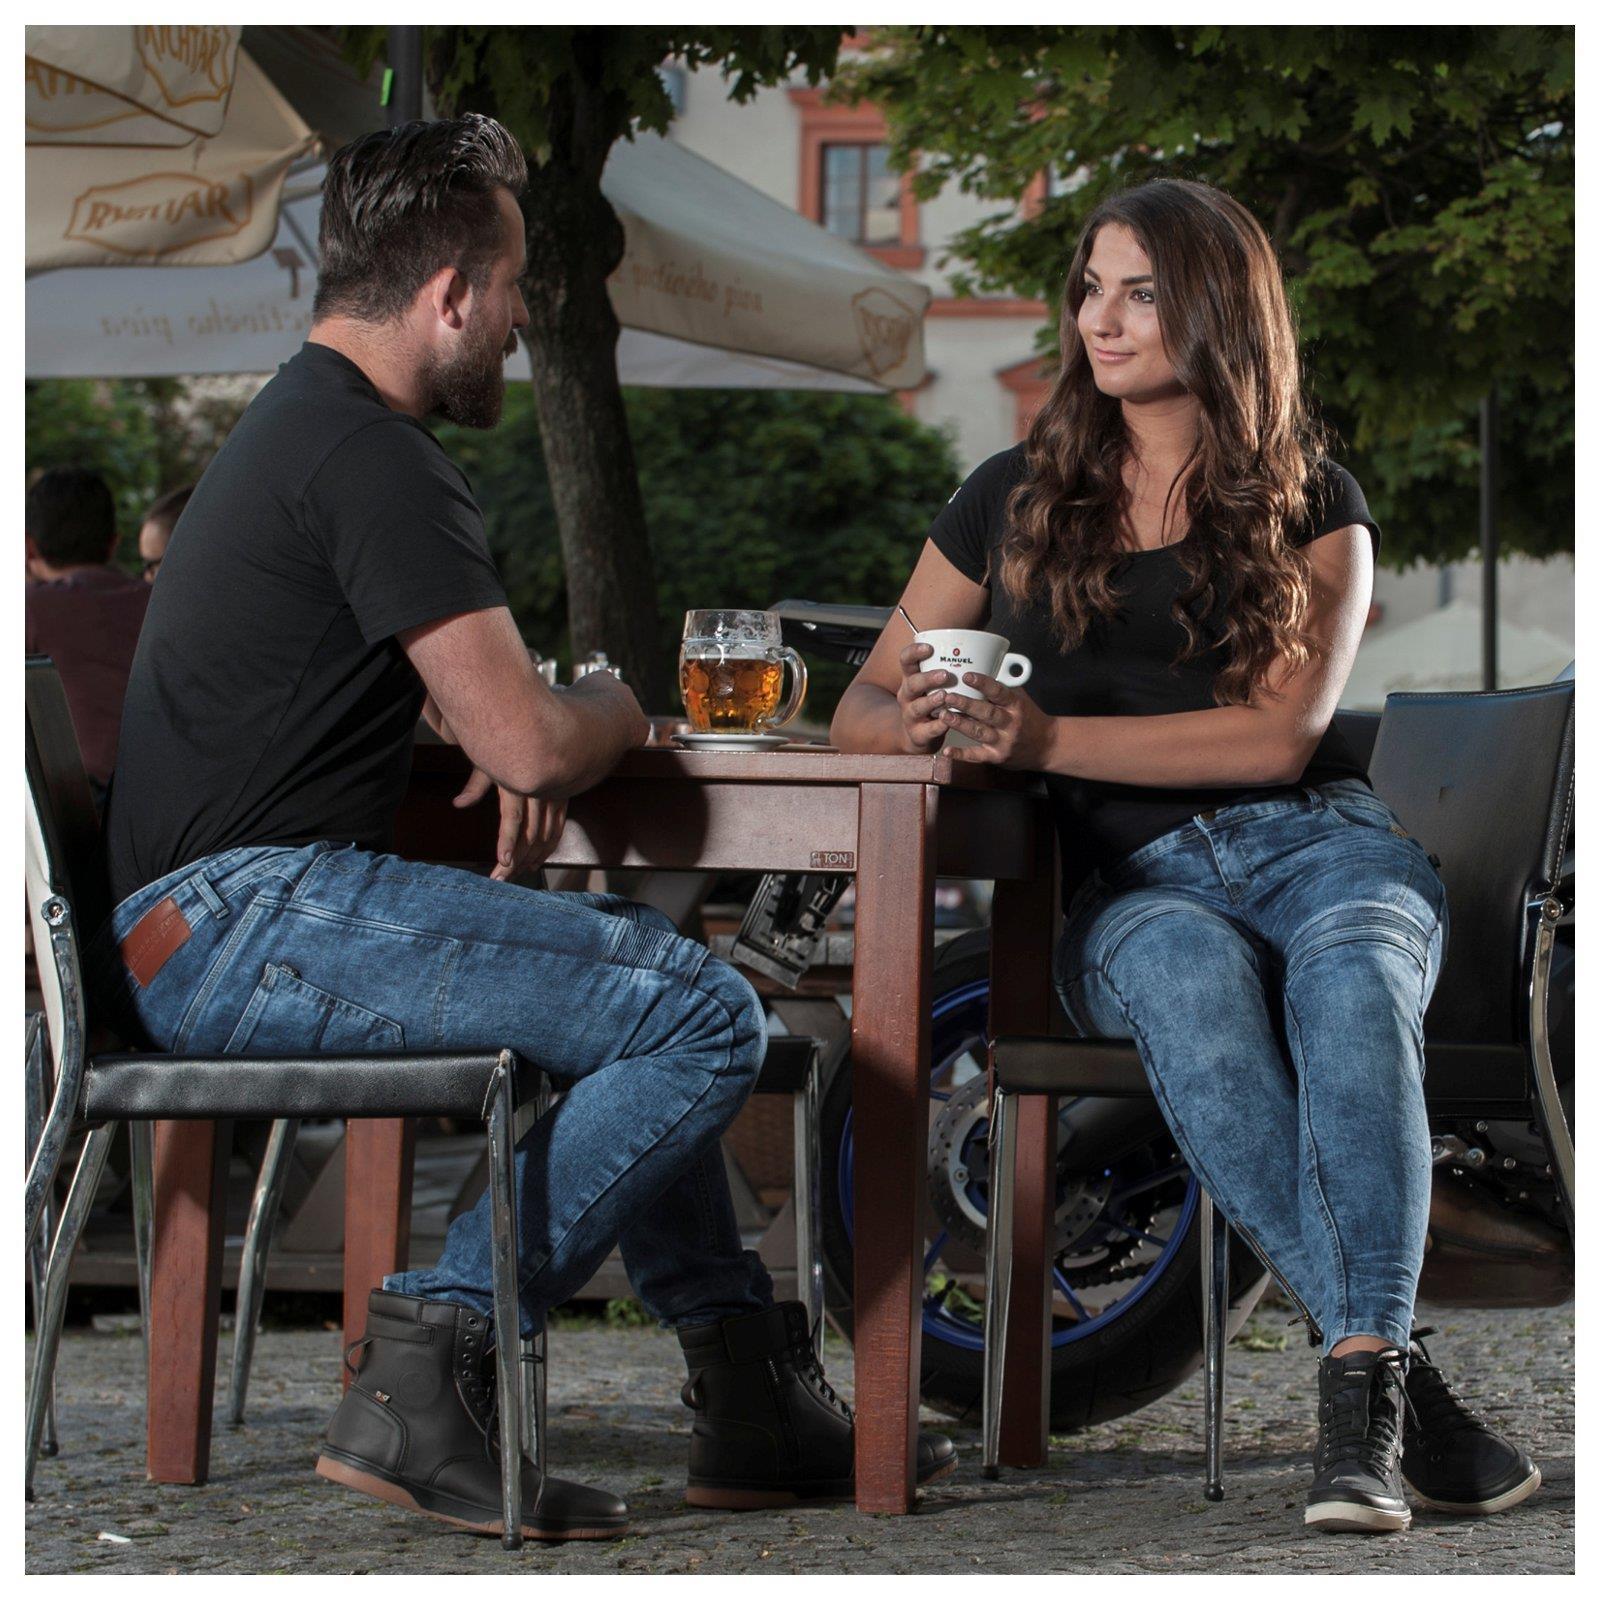 Trilobite-Pantaloni-Moto-Jeans-Abbigliamento-Parado-MICAS-URBAN-DUAL-PANTS-ACID miniatura 56